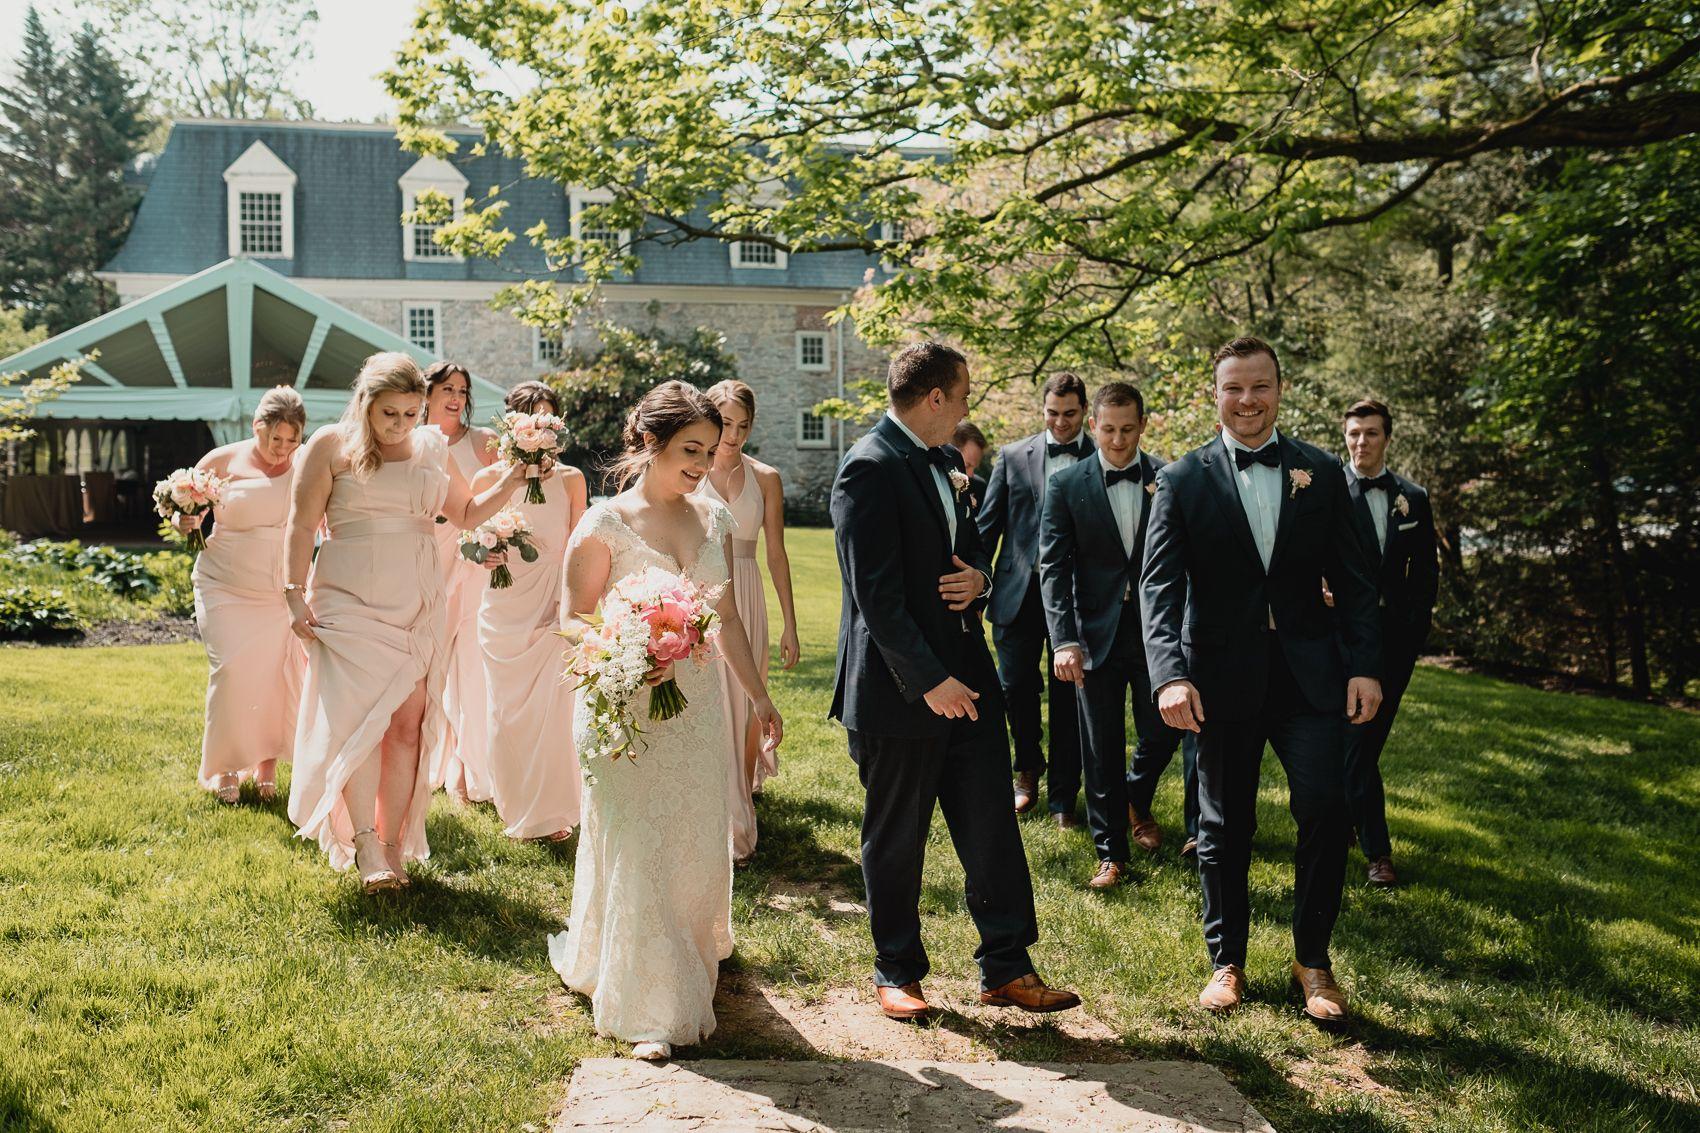 Pin On Destination Wedding Photography